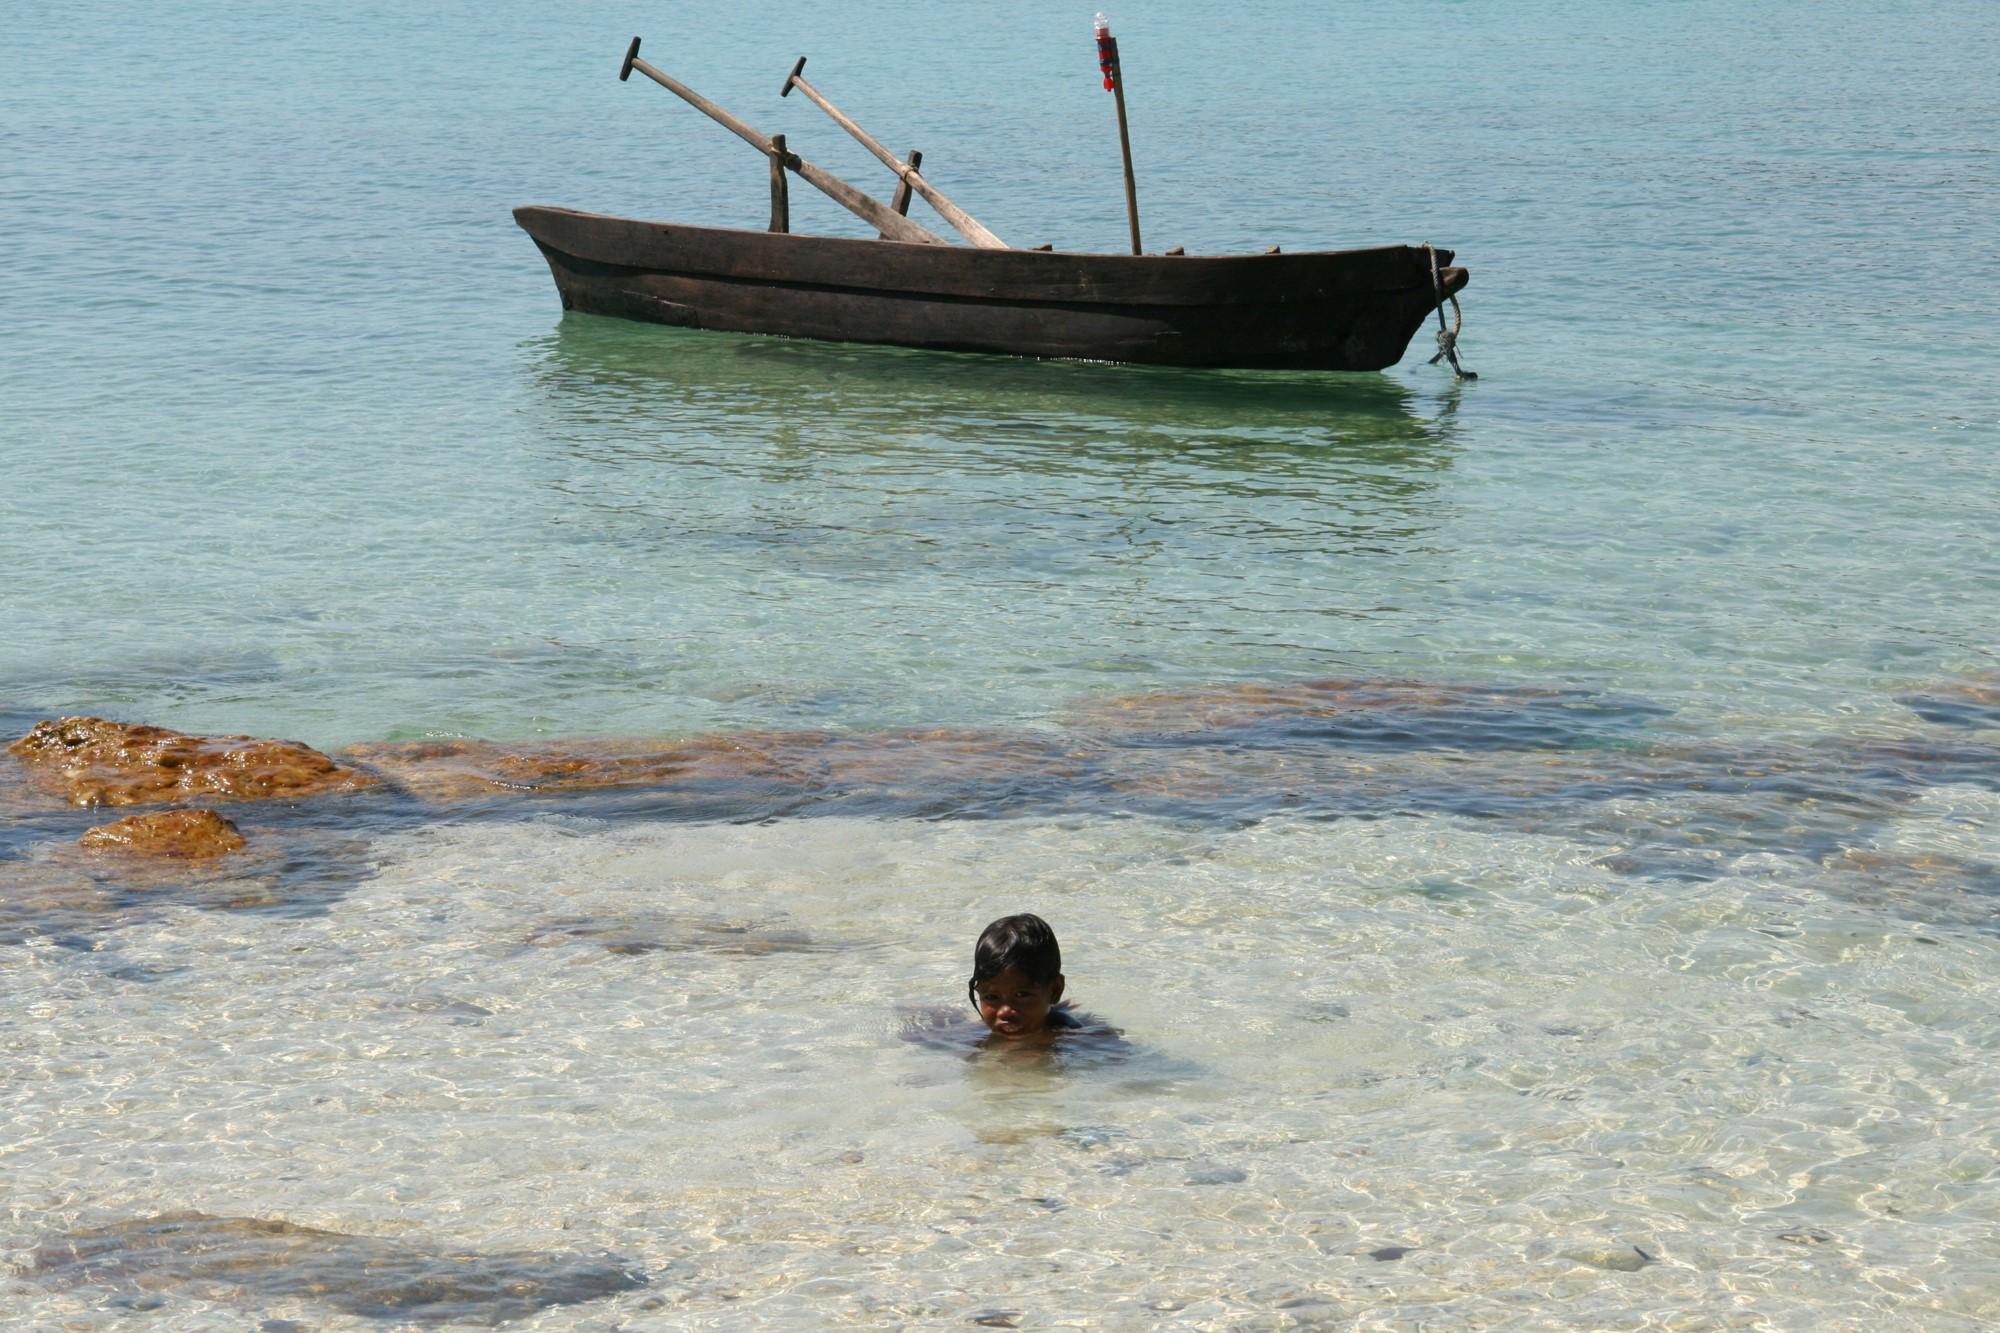 Mergui Archipelago Sailing Experience departing from Khao Lak 2